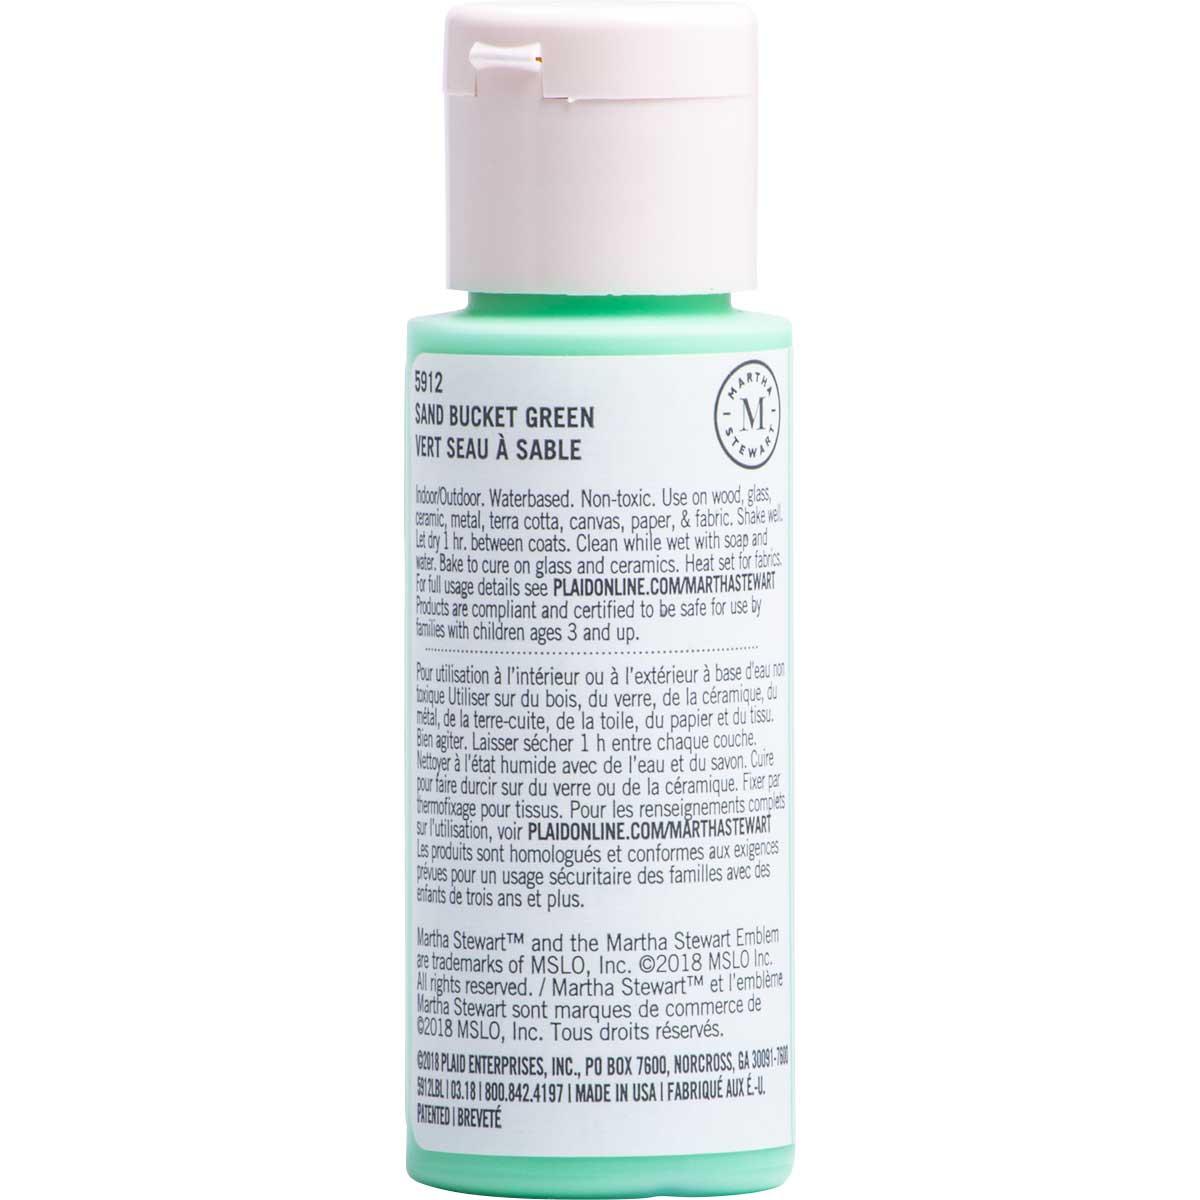 Martha Stewart ® Multi-Surface Satin Acrylic Craft Paint CPSIA - Sand Bucket Green, 2 oz. - 5912